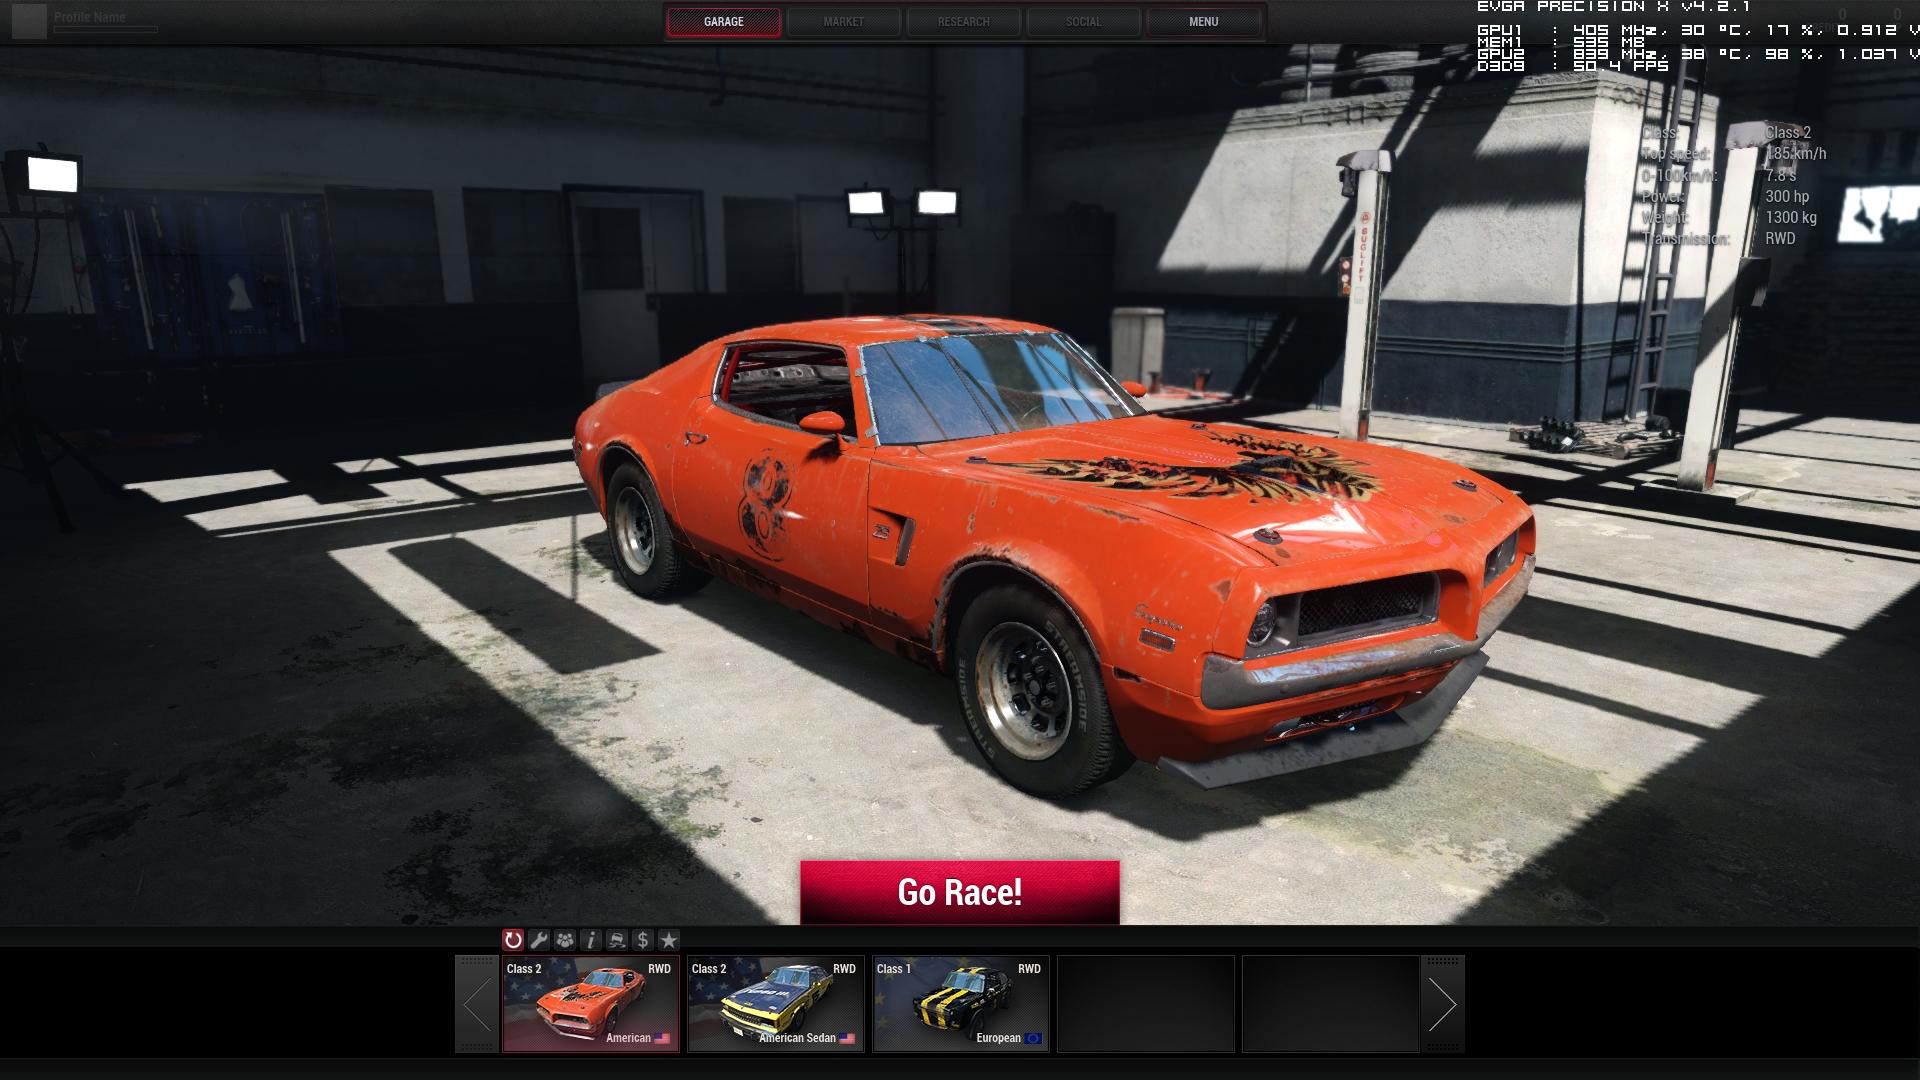 communaute steam guide next car game wreckfest sli fix how before 50 4fps